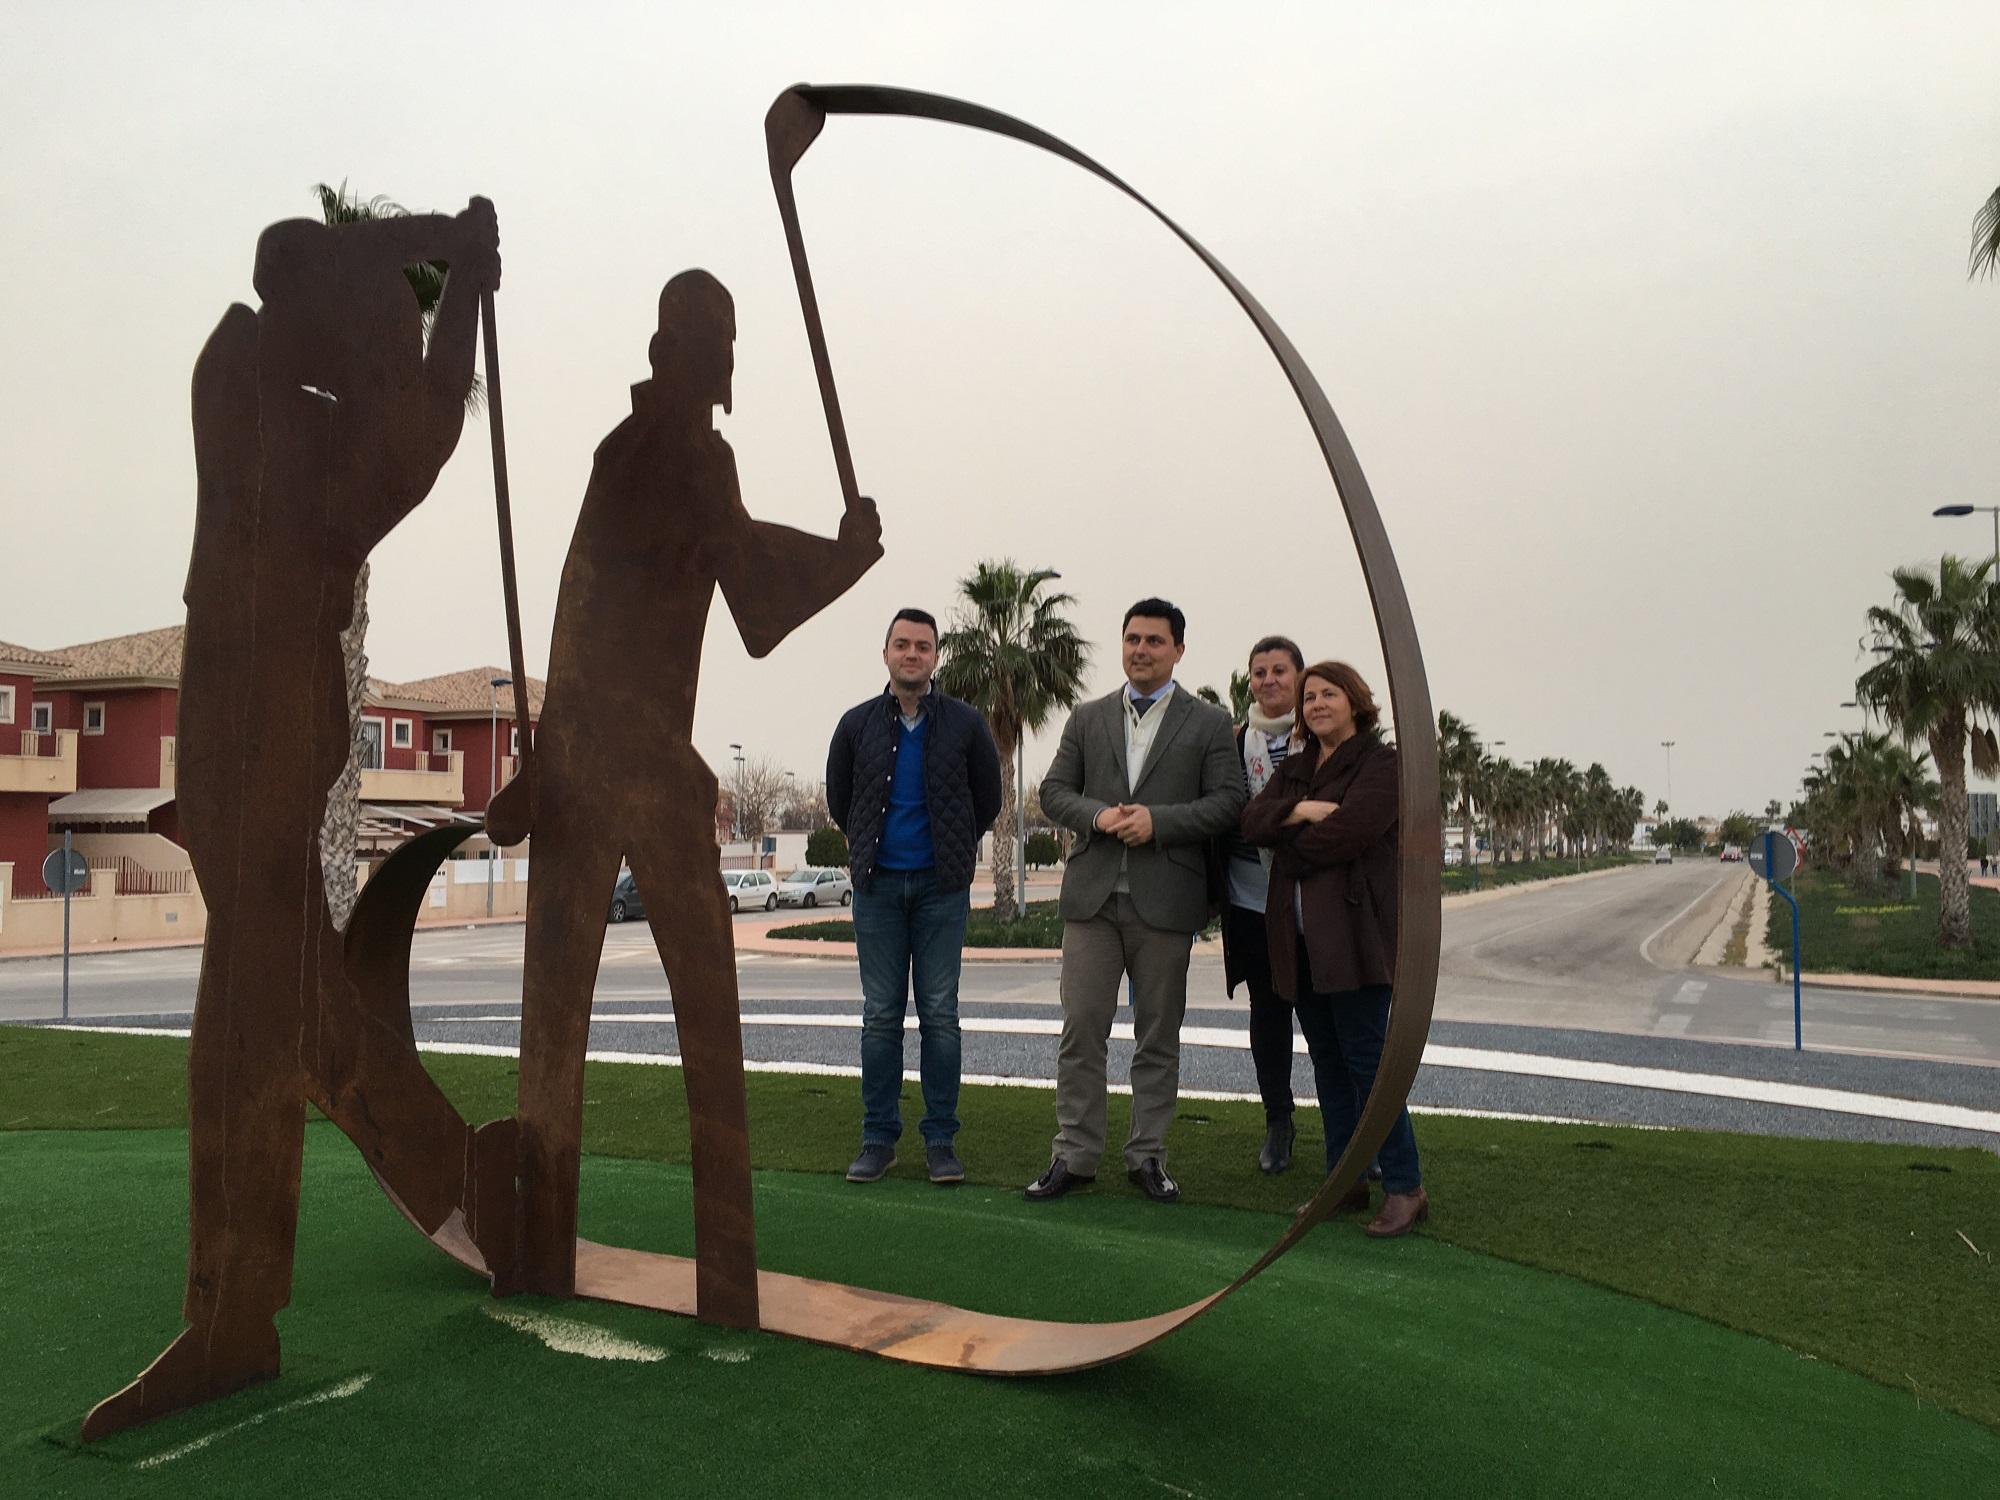 Euro Roda estrena rotonda dedicada al golf